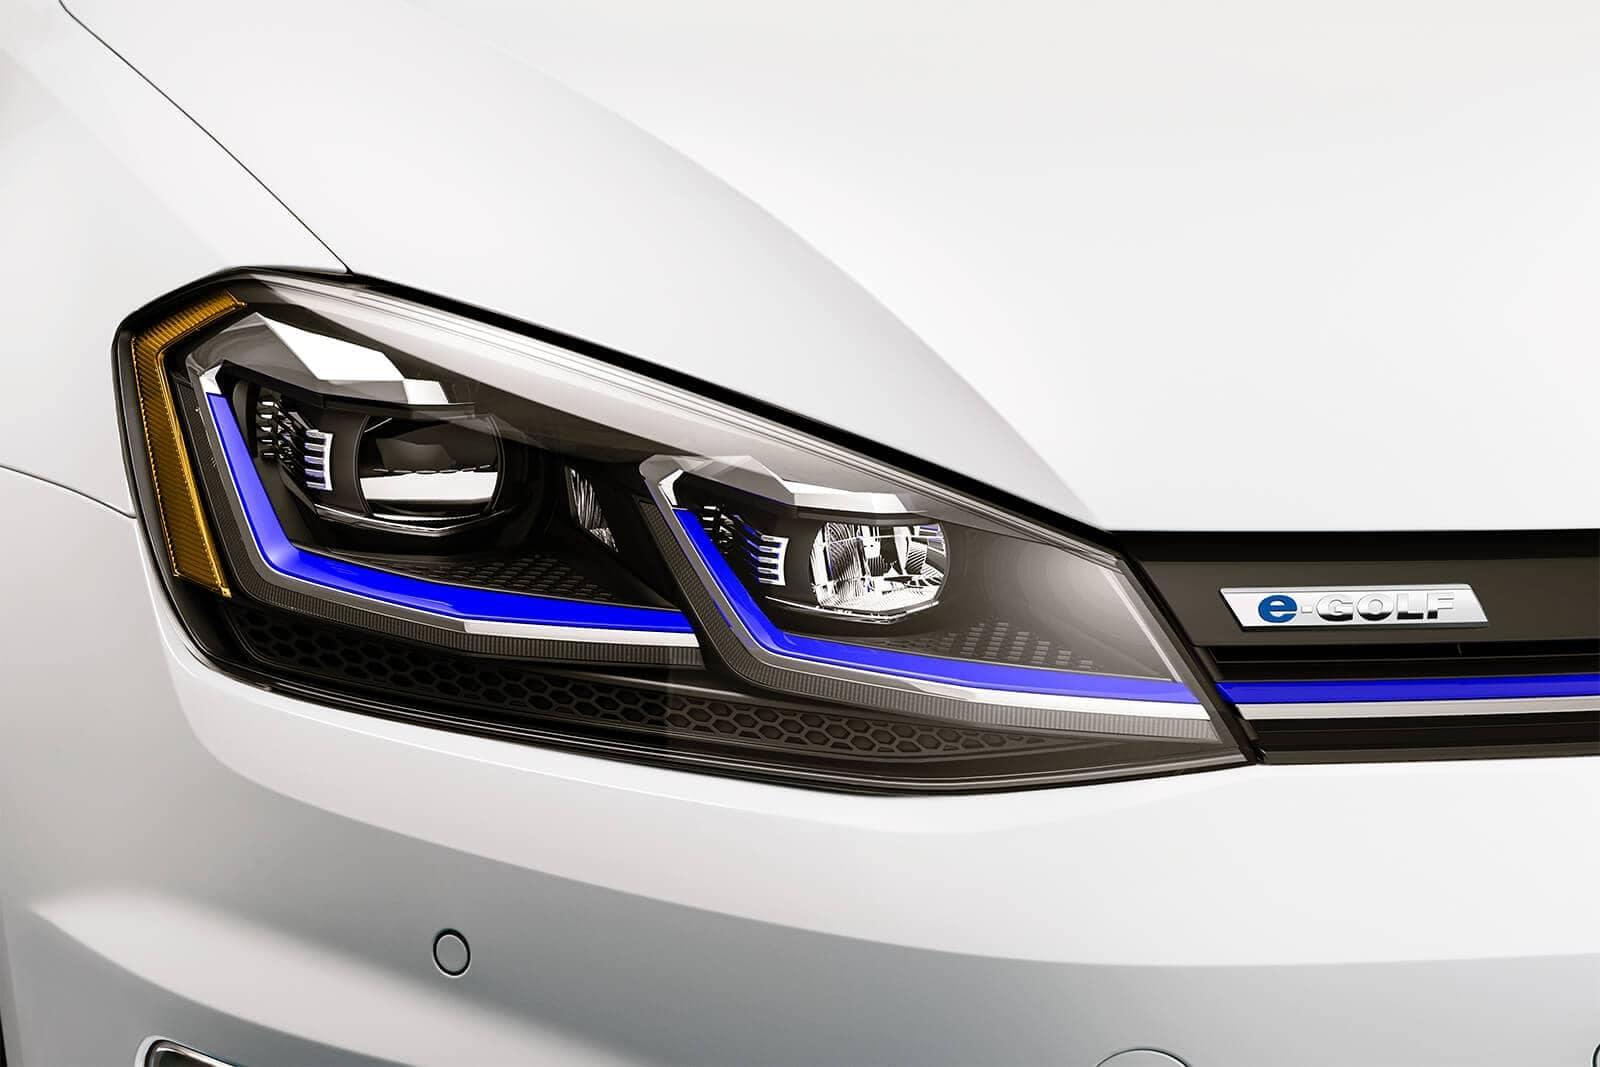 2019 Volkswagen e-Golf headlight